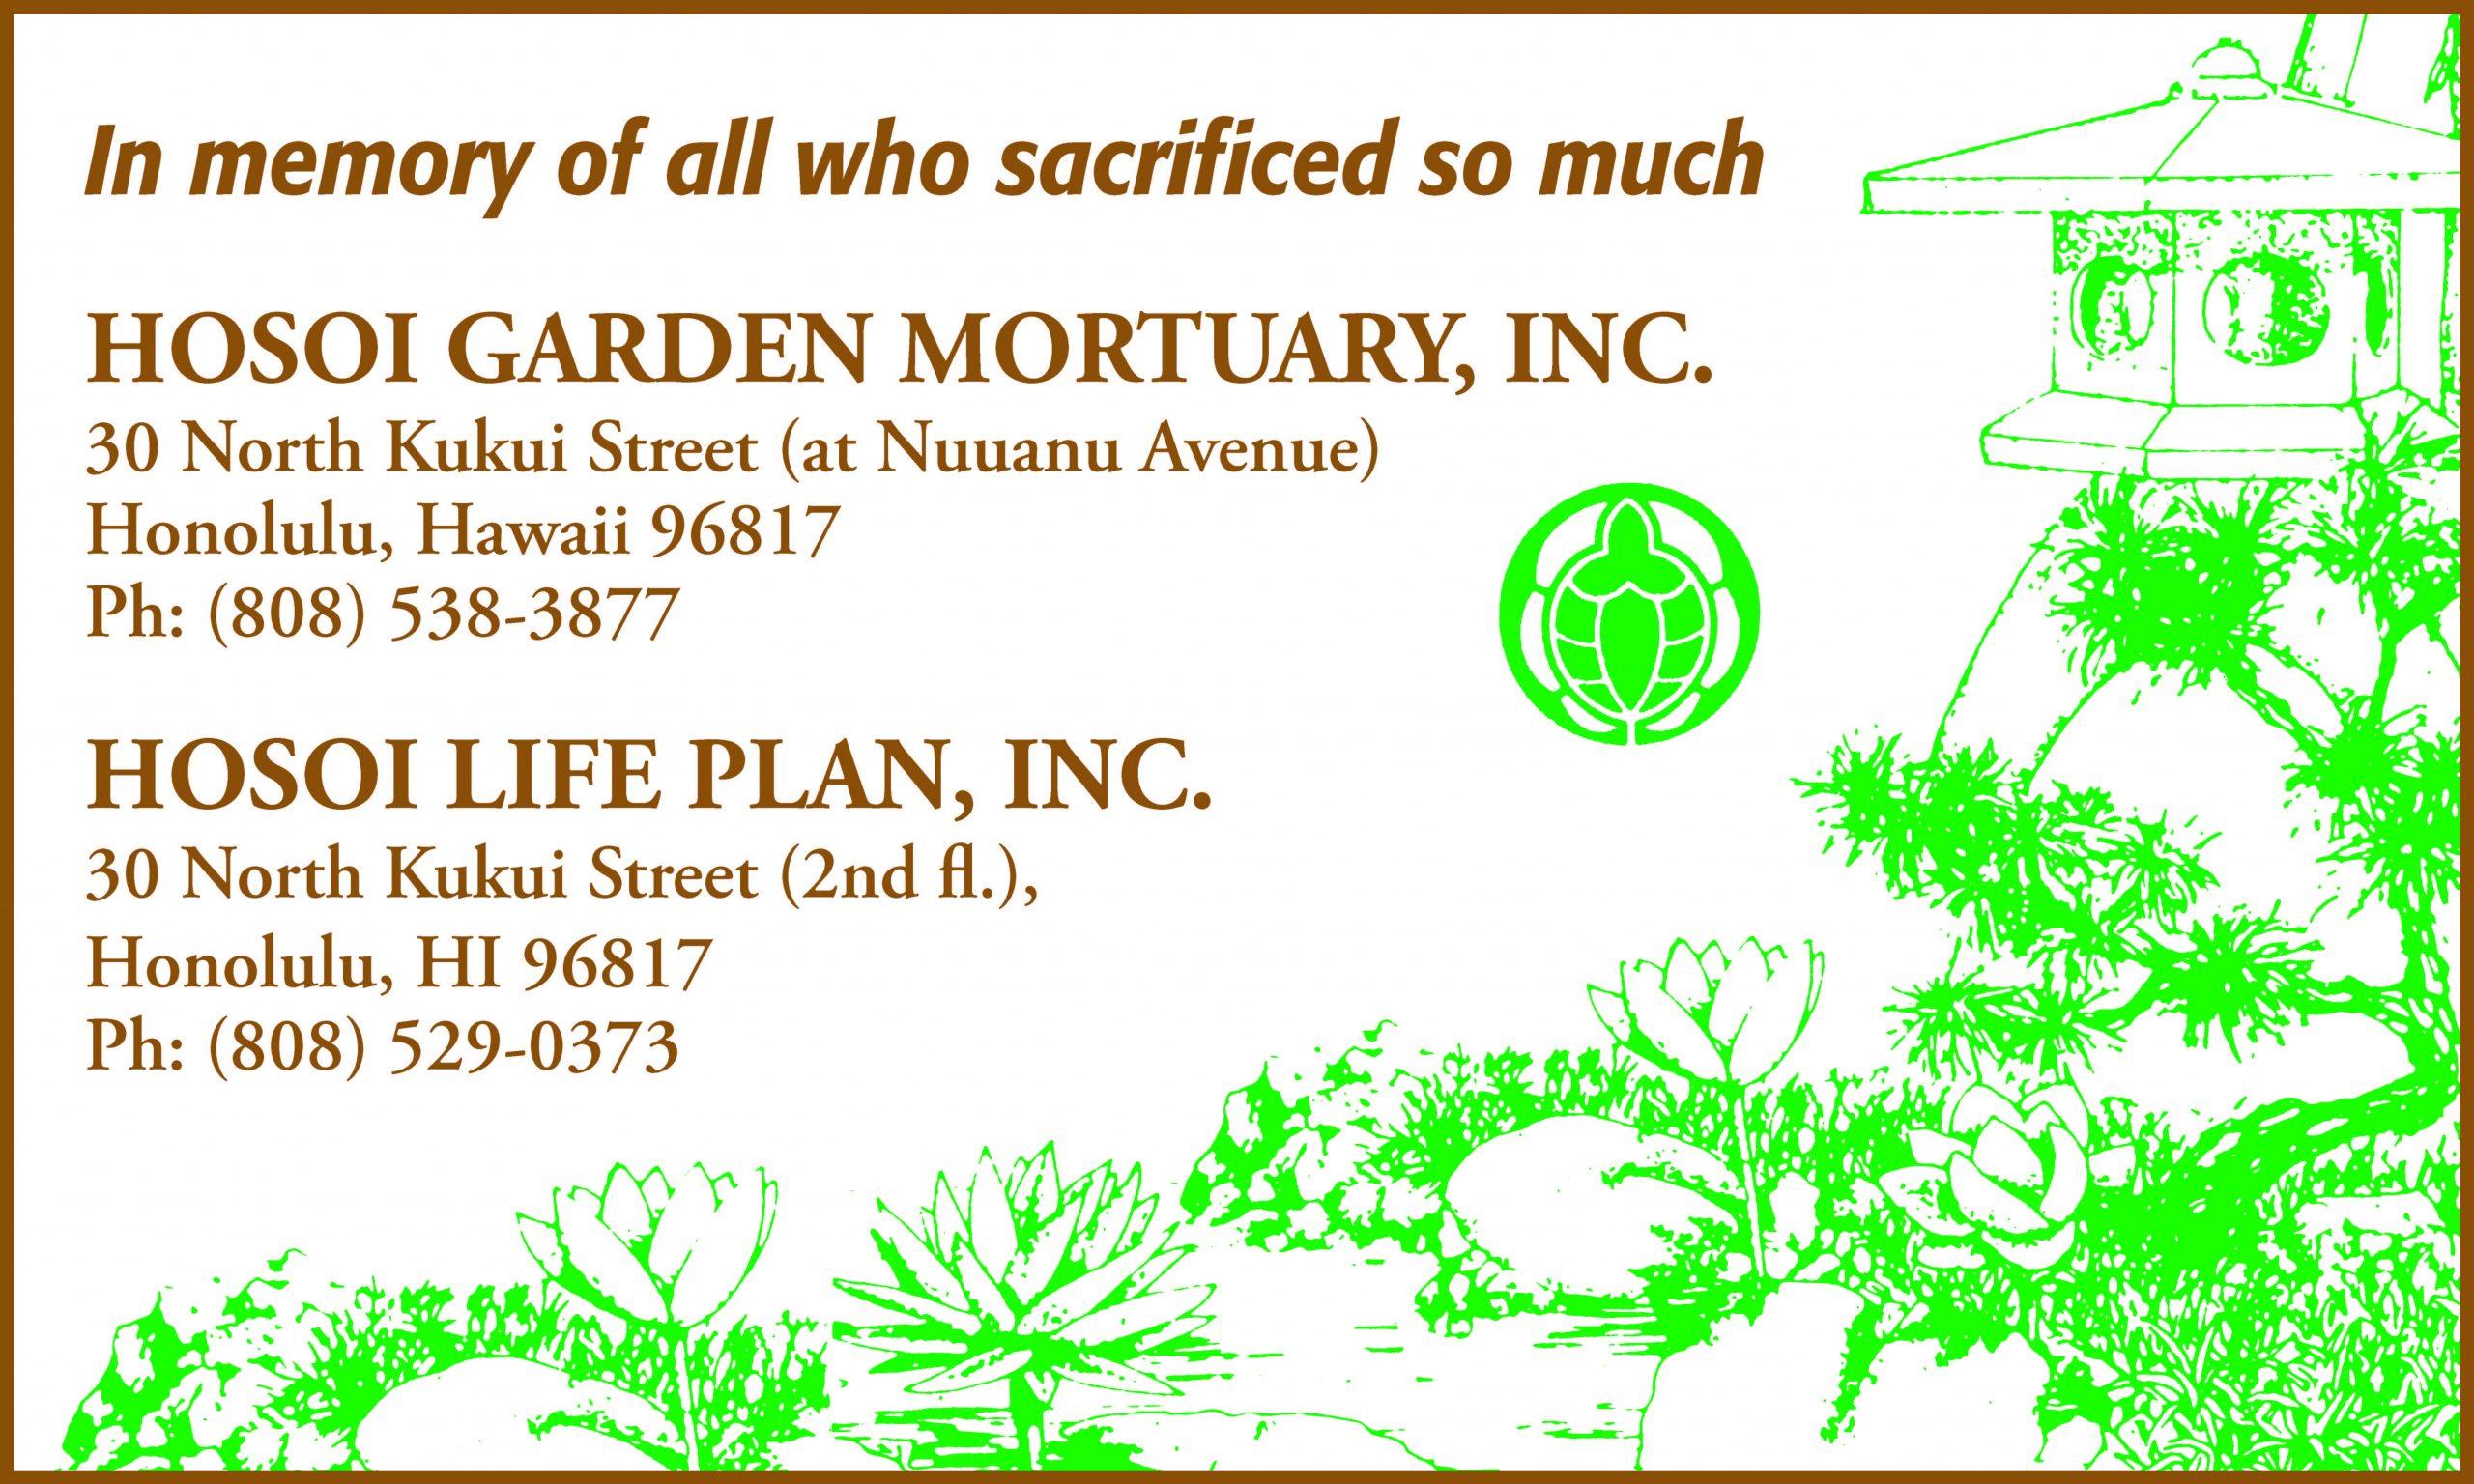 Hosoi Memorial Day ad